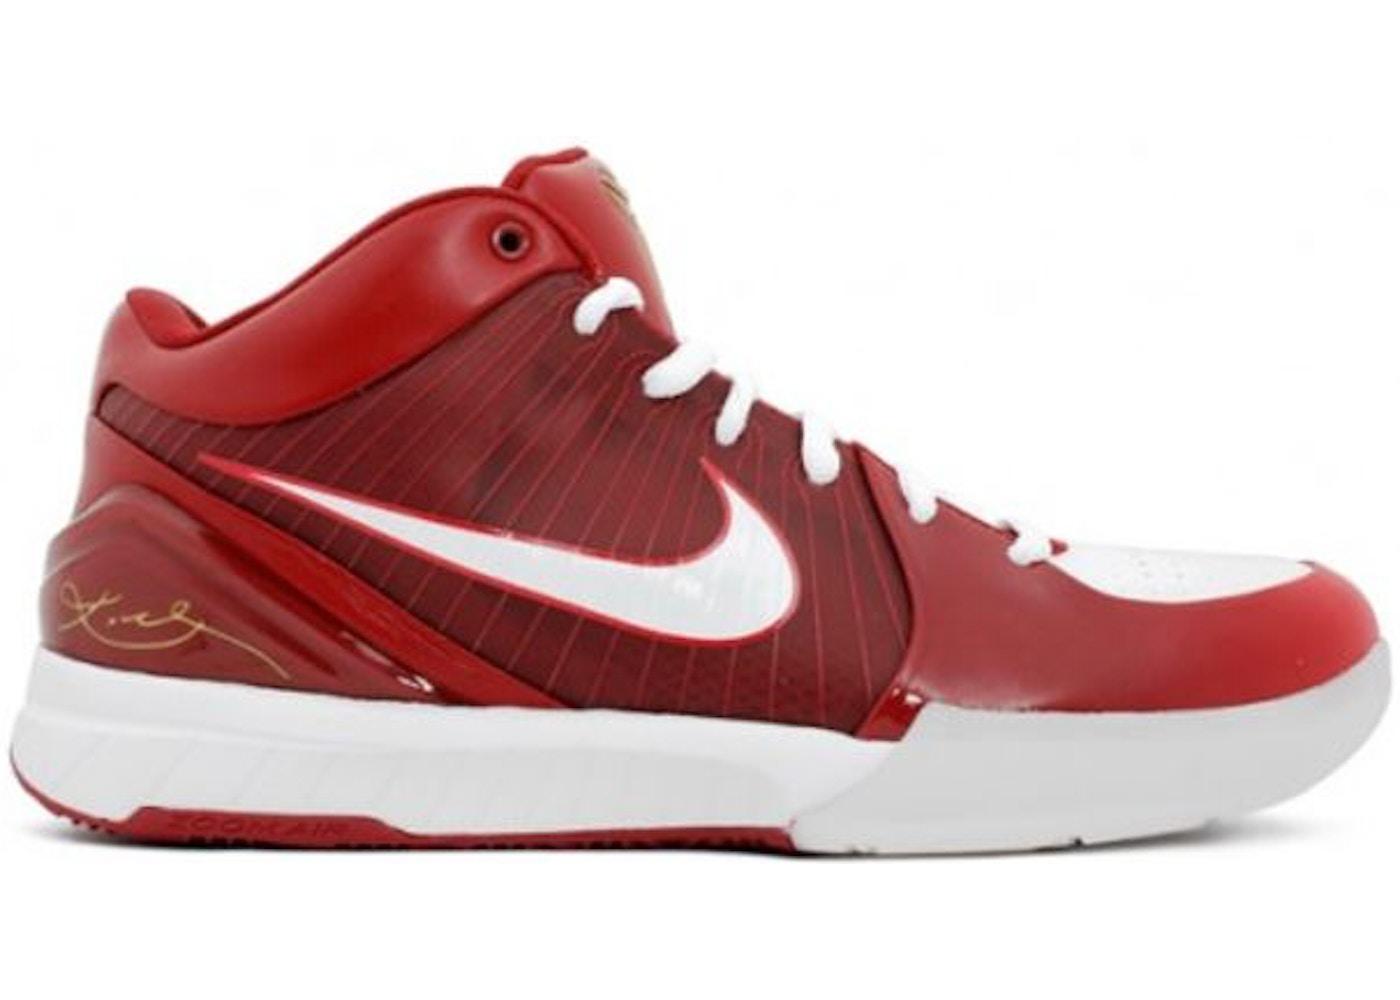 best sneakers 12cc6 c68d2 Kobe 4 All Star - 361163-611